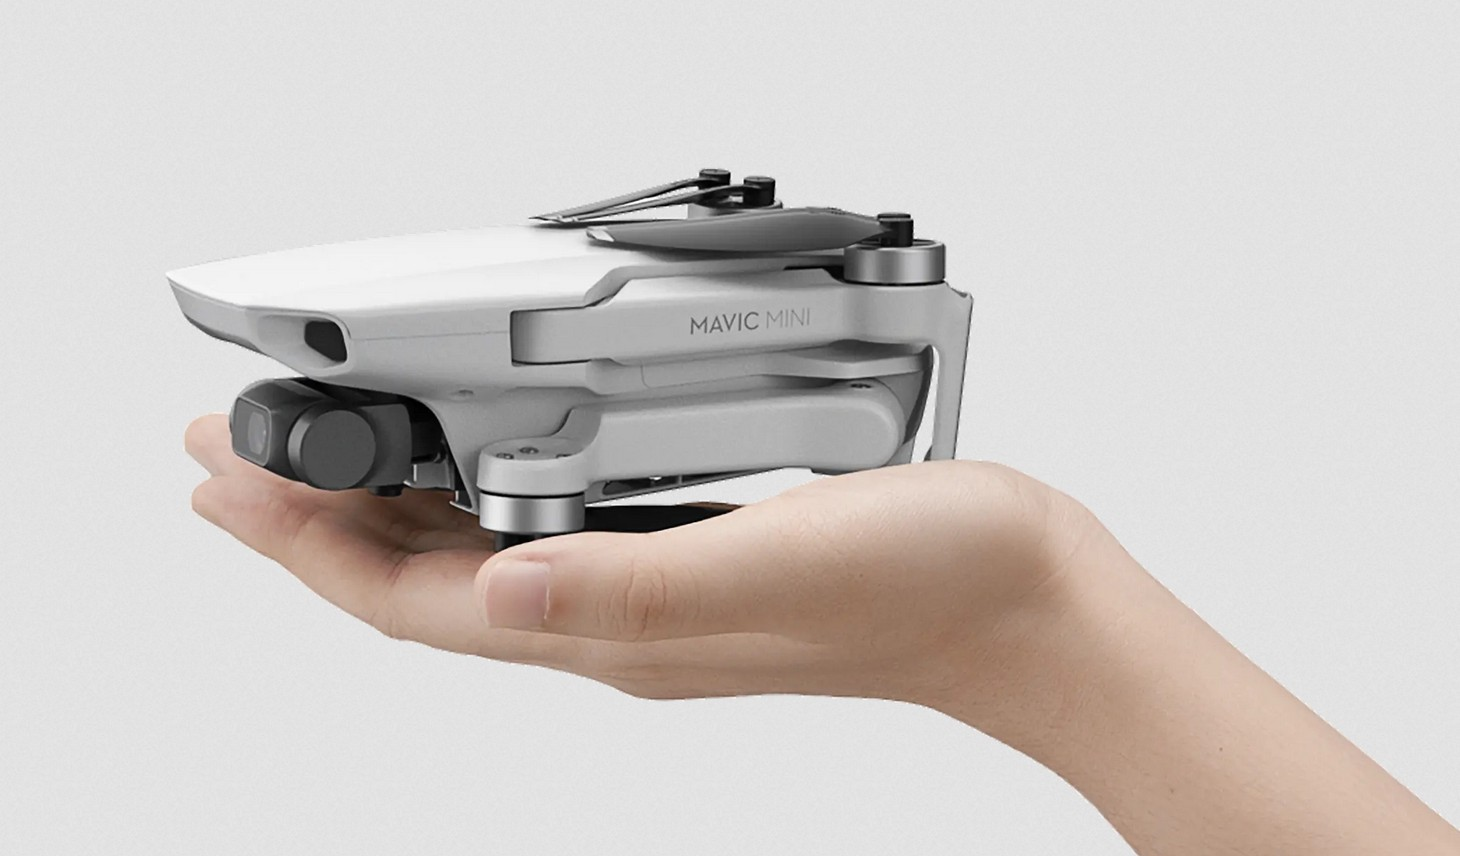 DJI Mavic Mini: Winzige Falt-Drohne zum attraktiven Preis